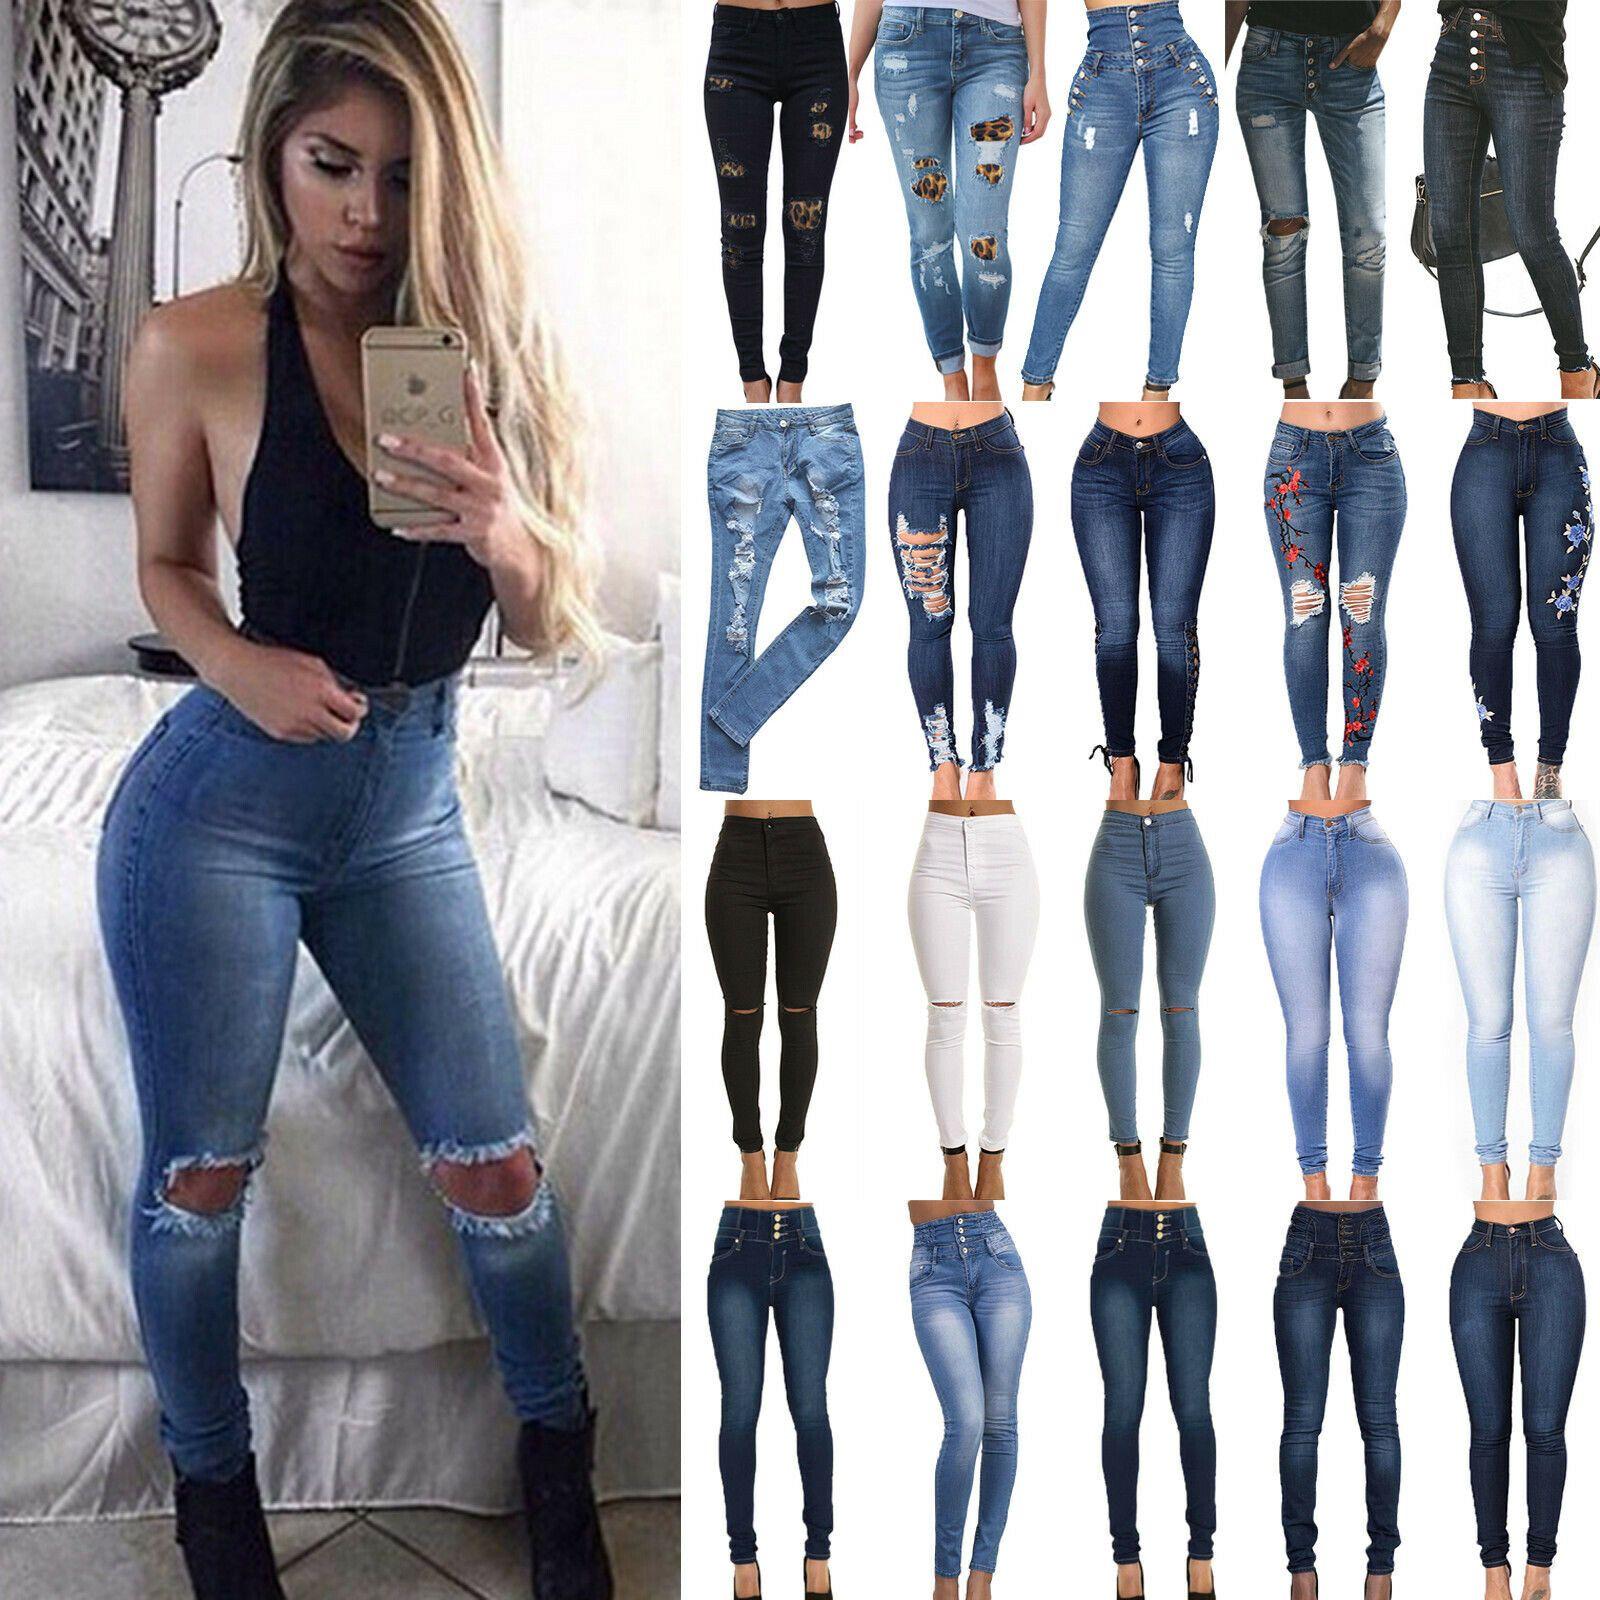 Women Ripped Skinny Denim Jeans Jeggings Casual High Waist Slim Trousers Pants